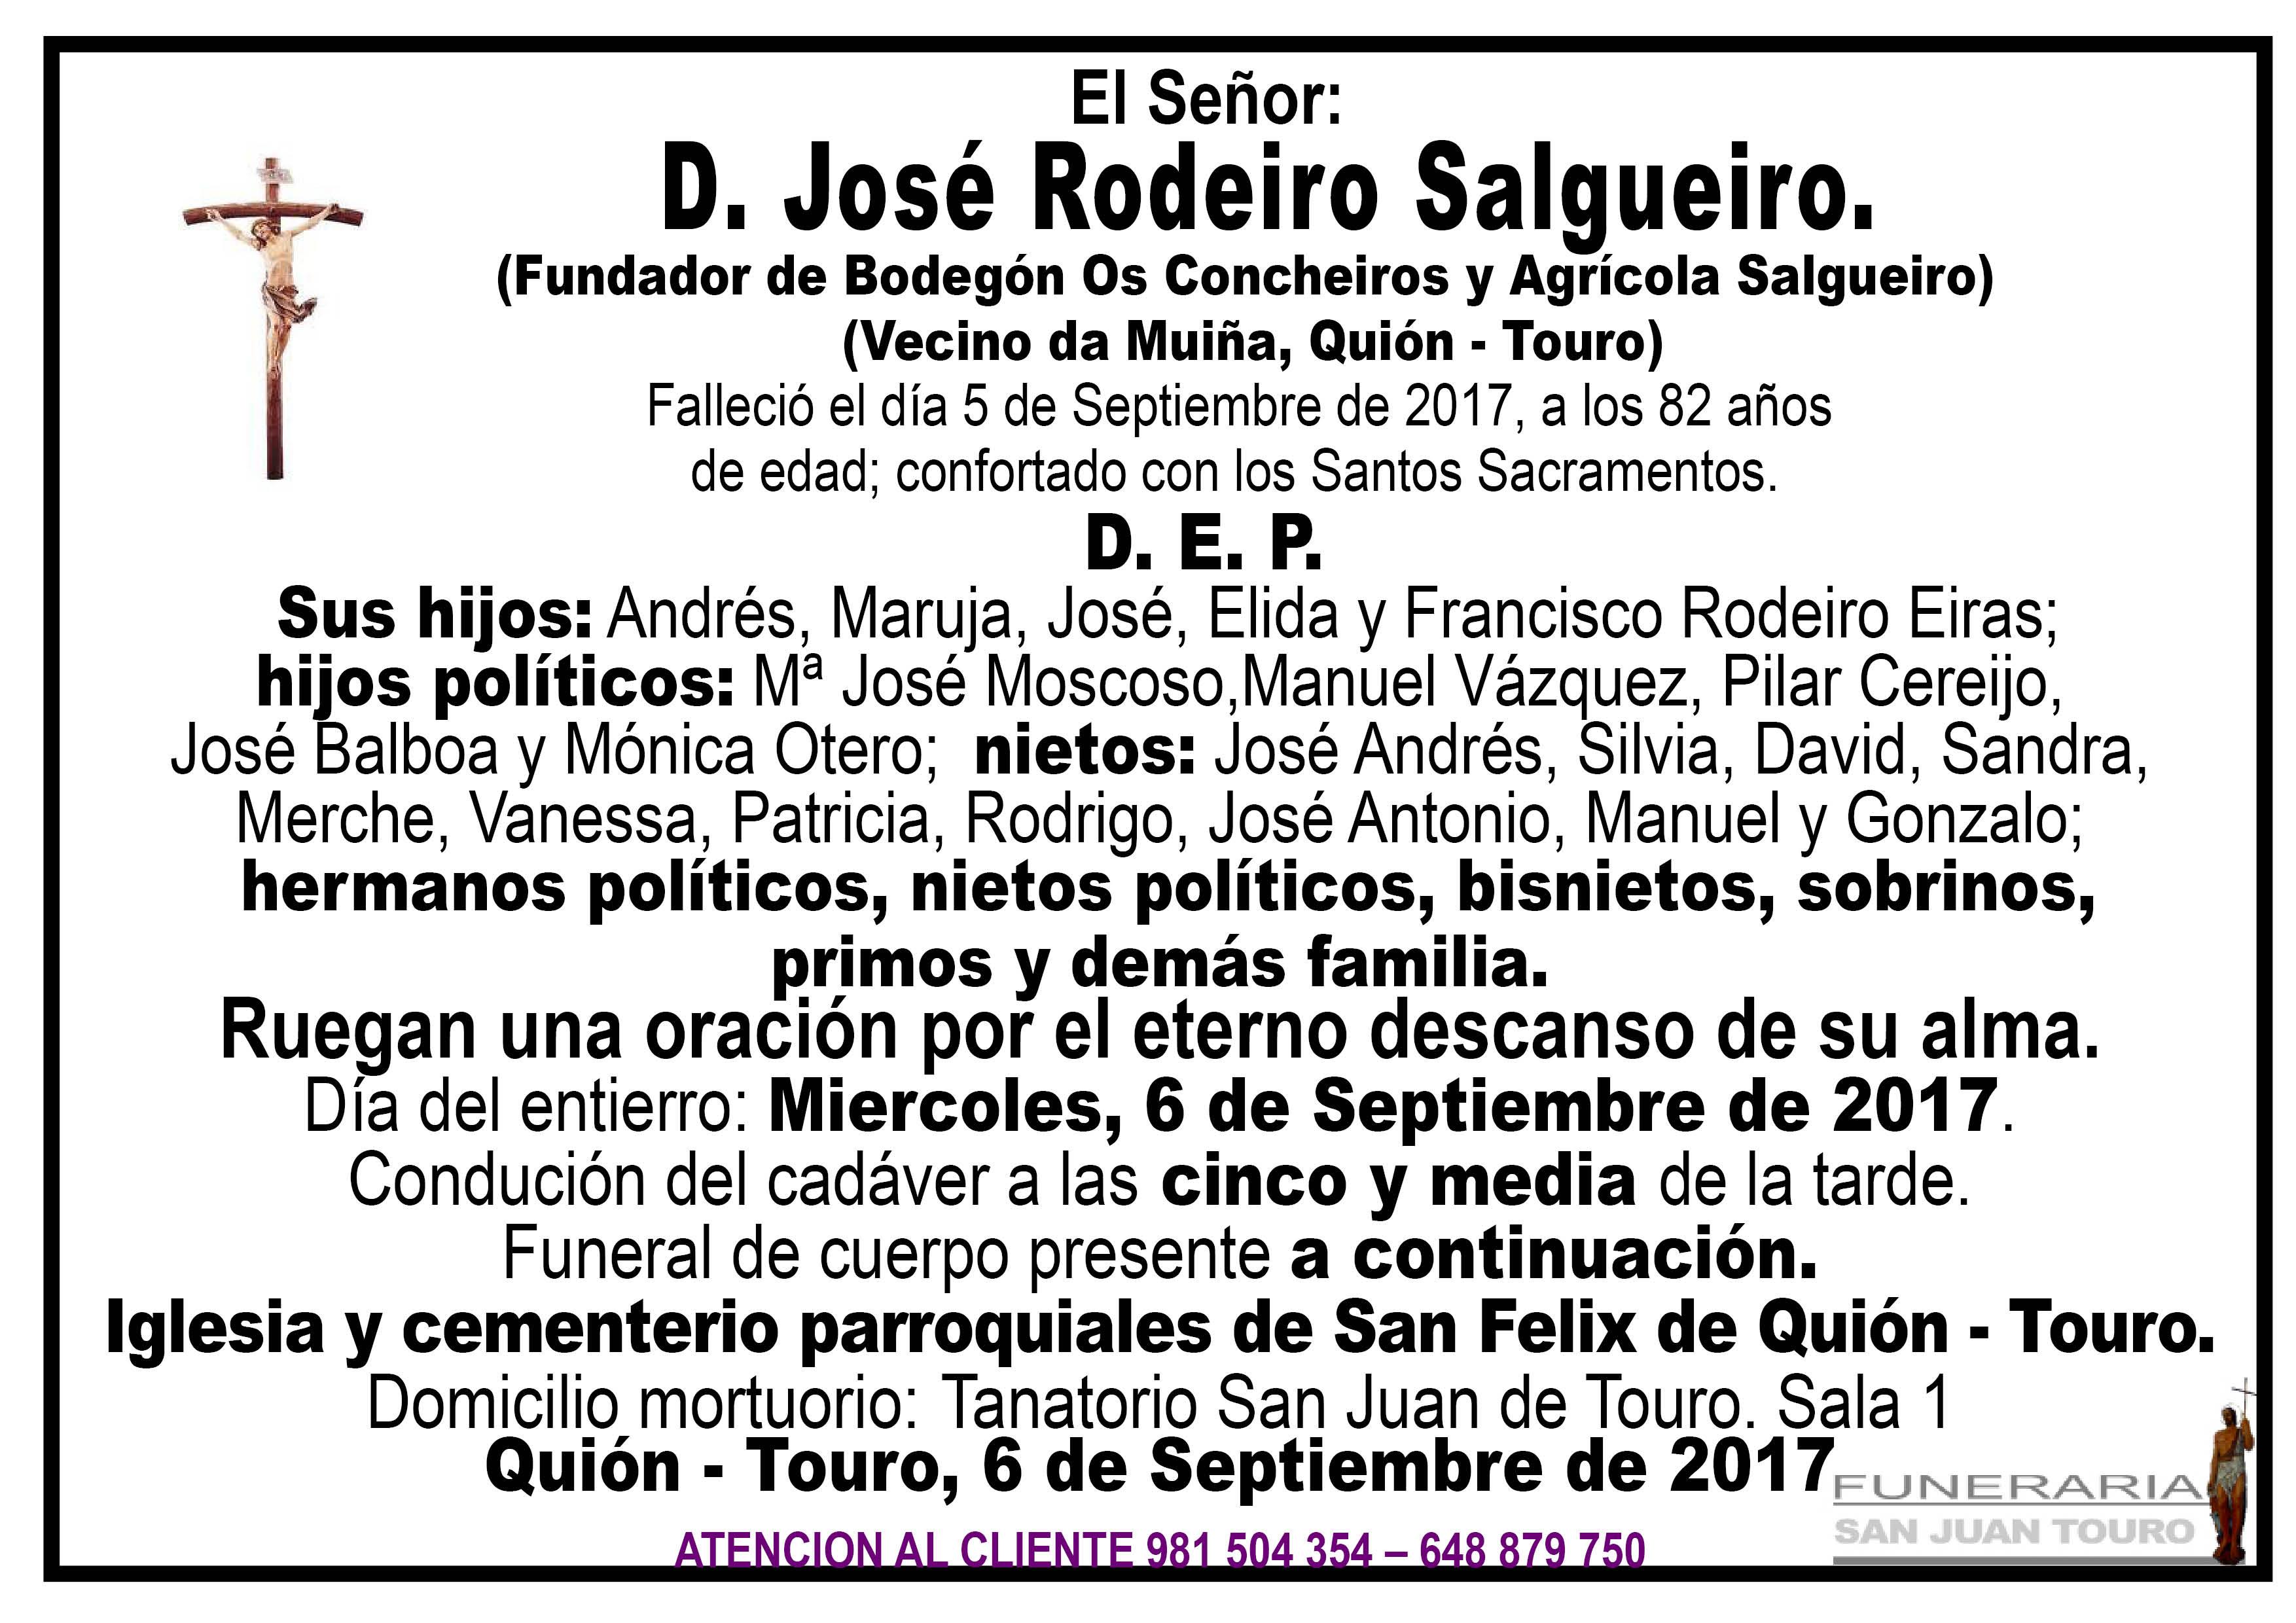 Esquela de SEPELIO DE JOSE RODEIRO SALGUEIRO